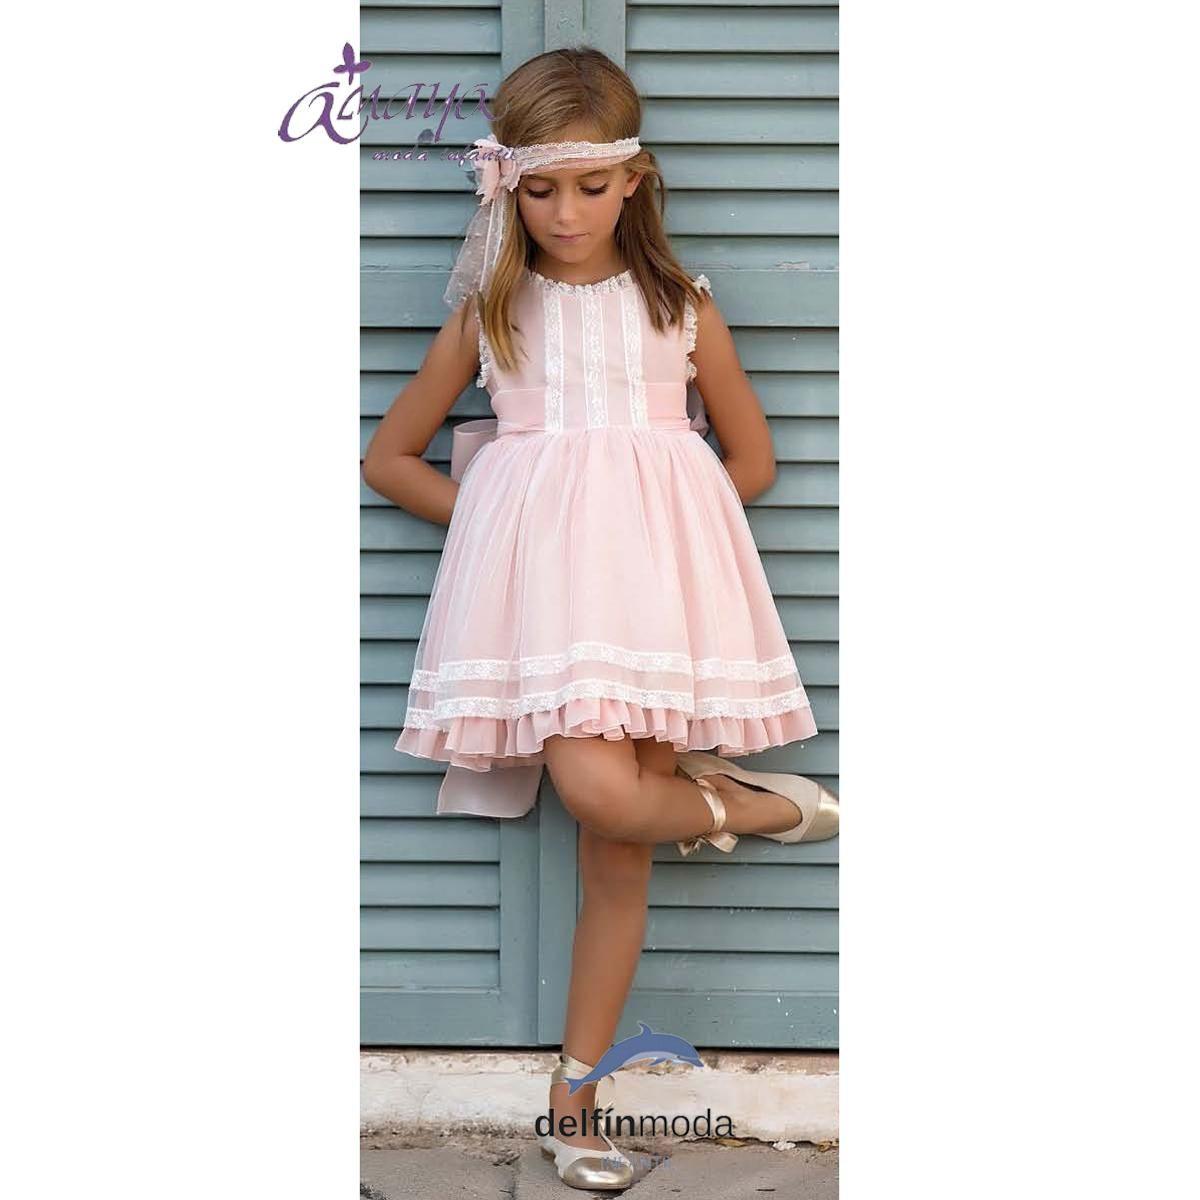 Catalogos de vestidos de fiesta para ninas